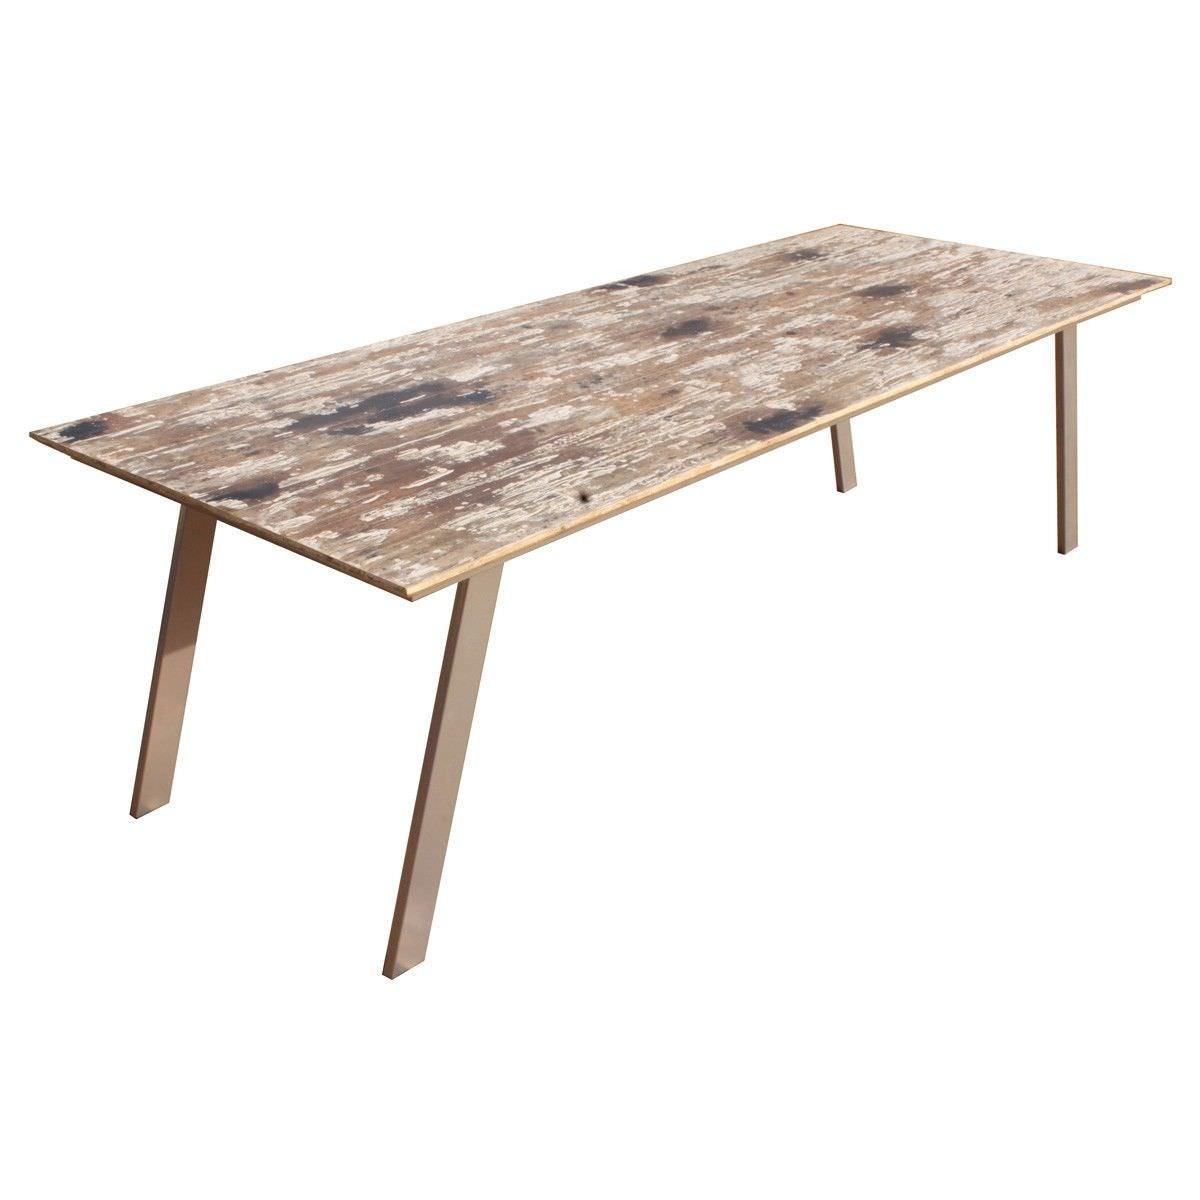 Mirlande Mango Wood Dining Table, 220cm